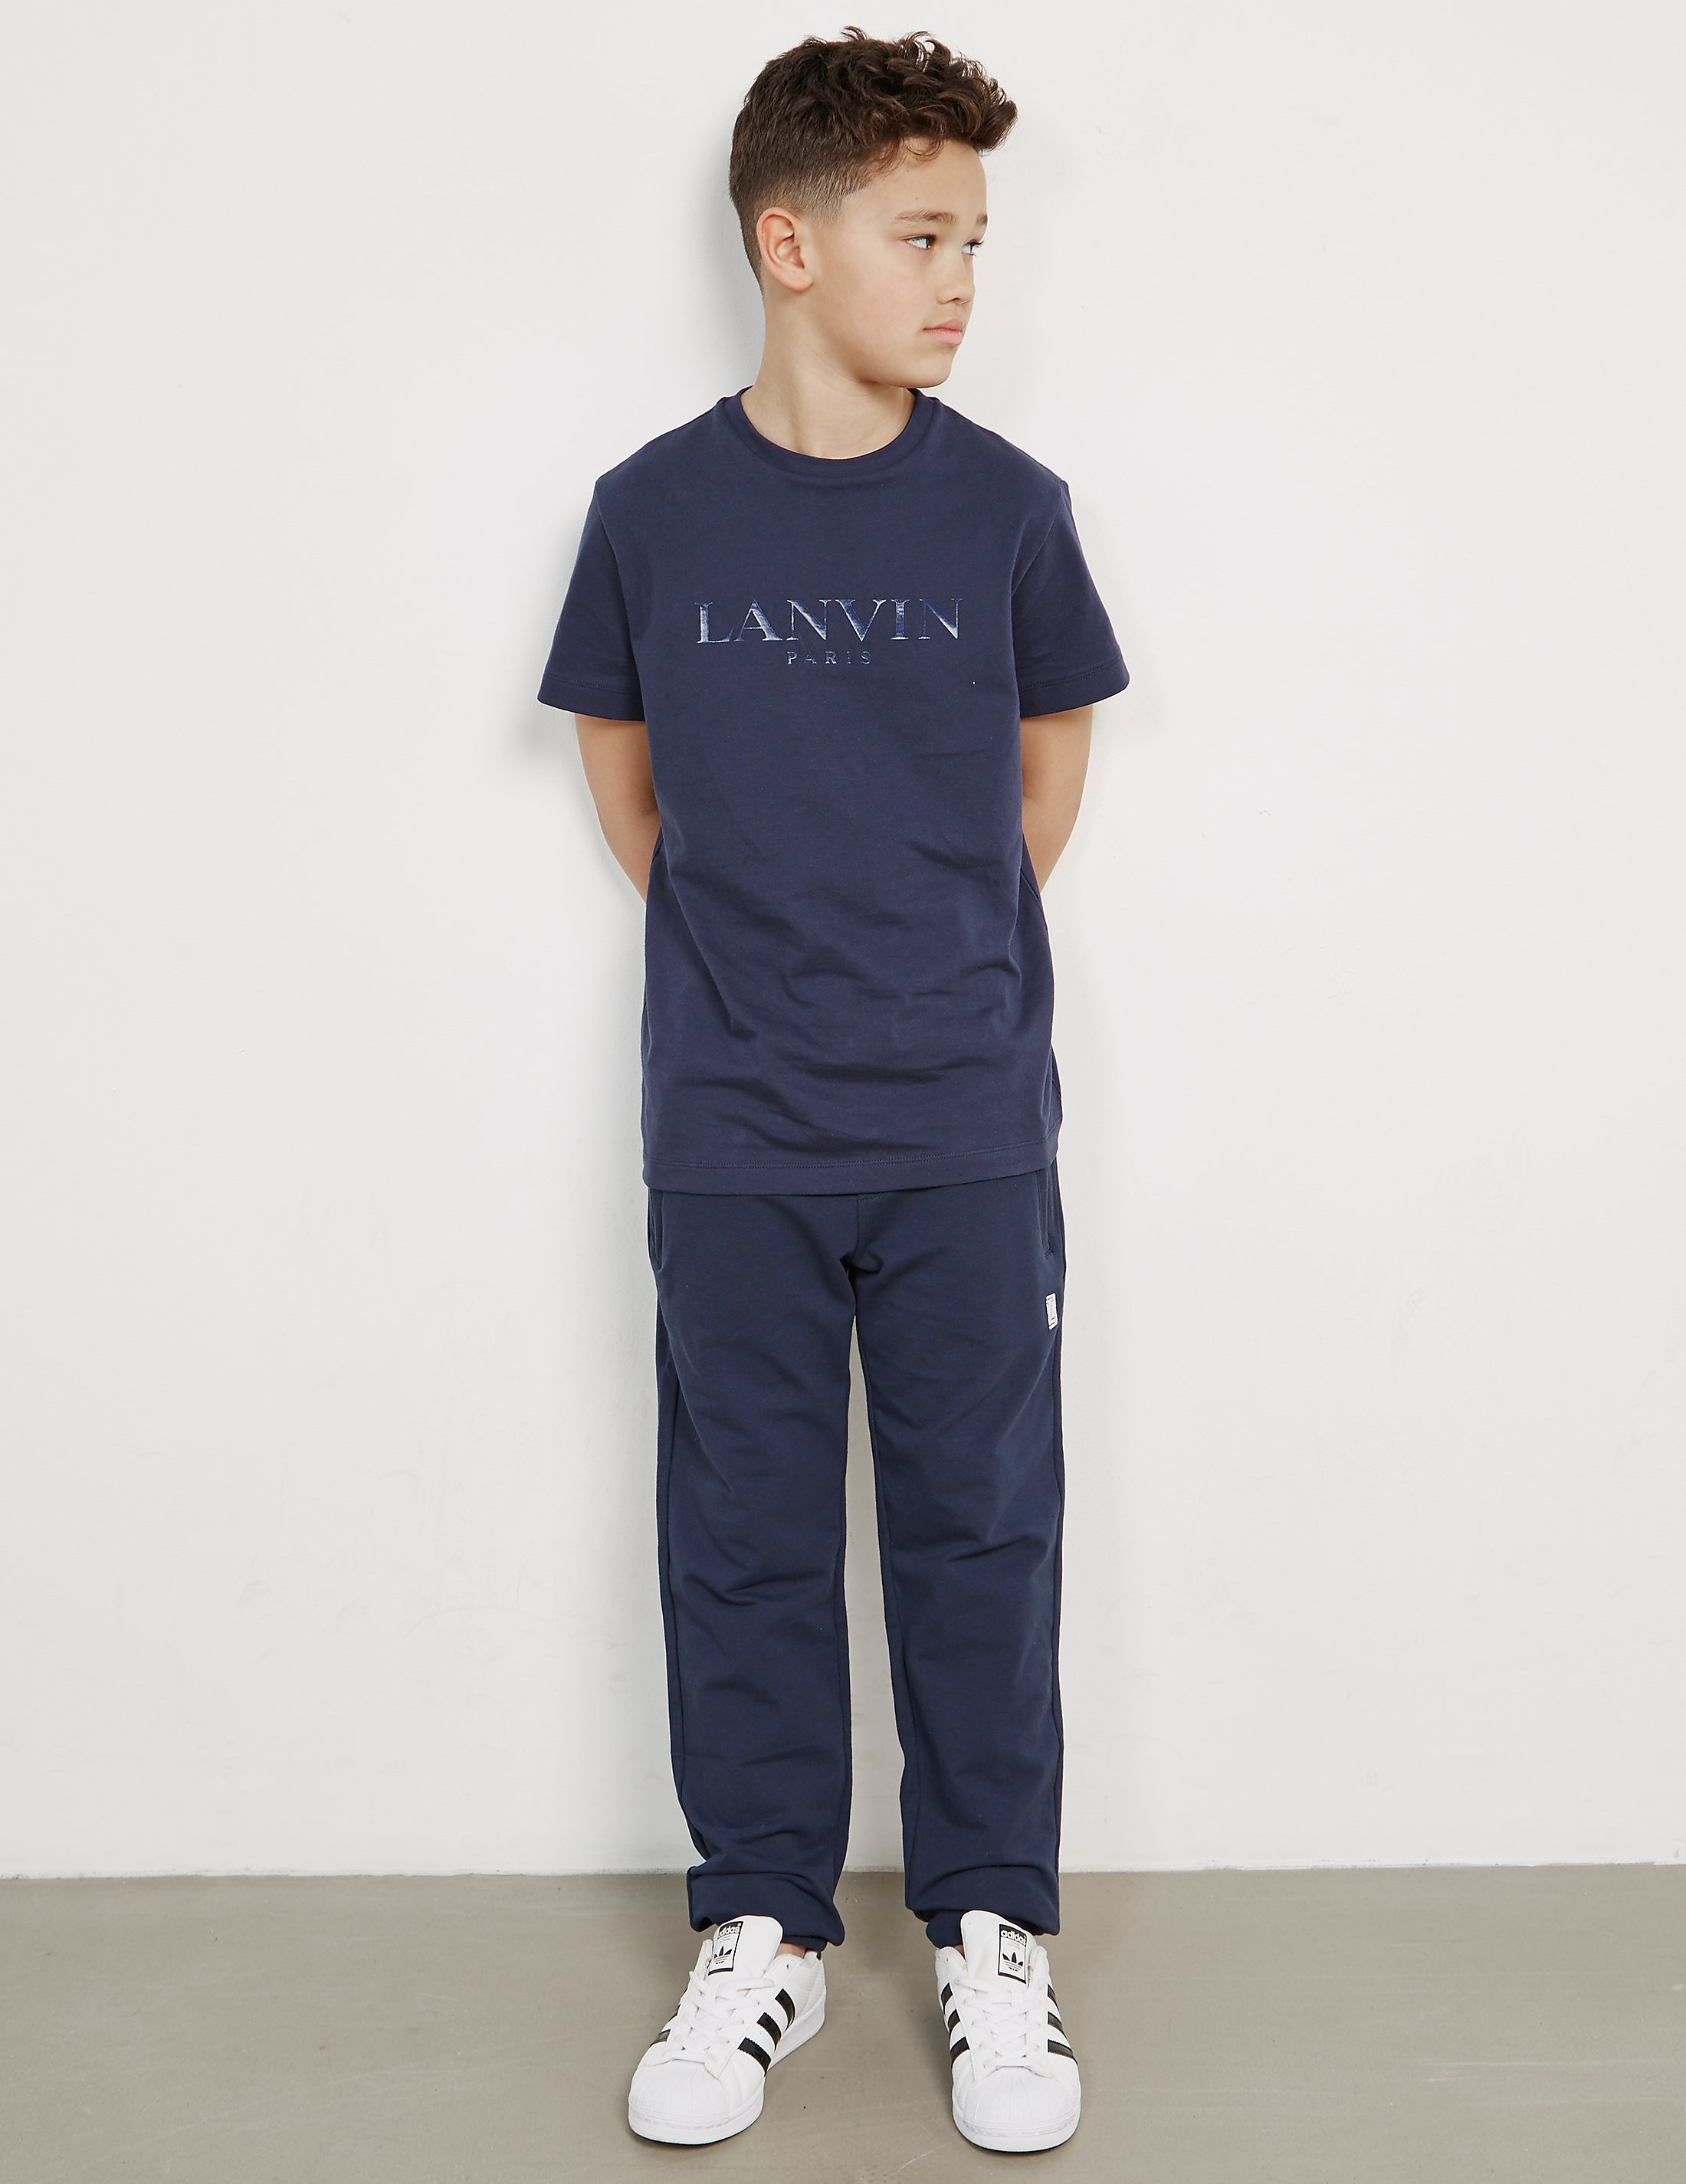 Lanvin Cuffed Track Pants